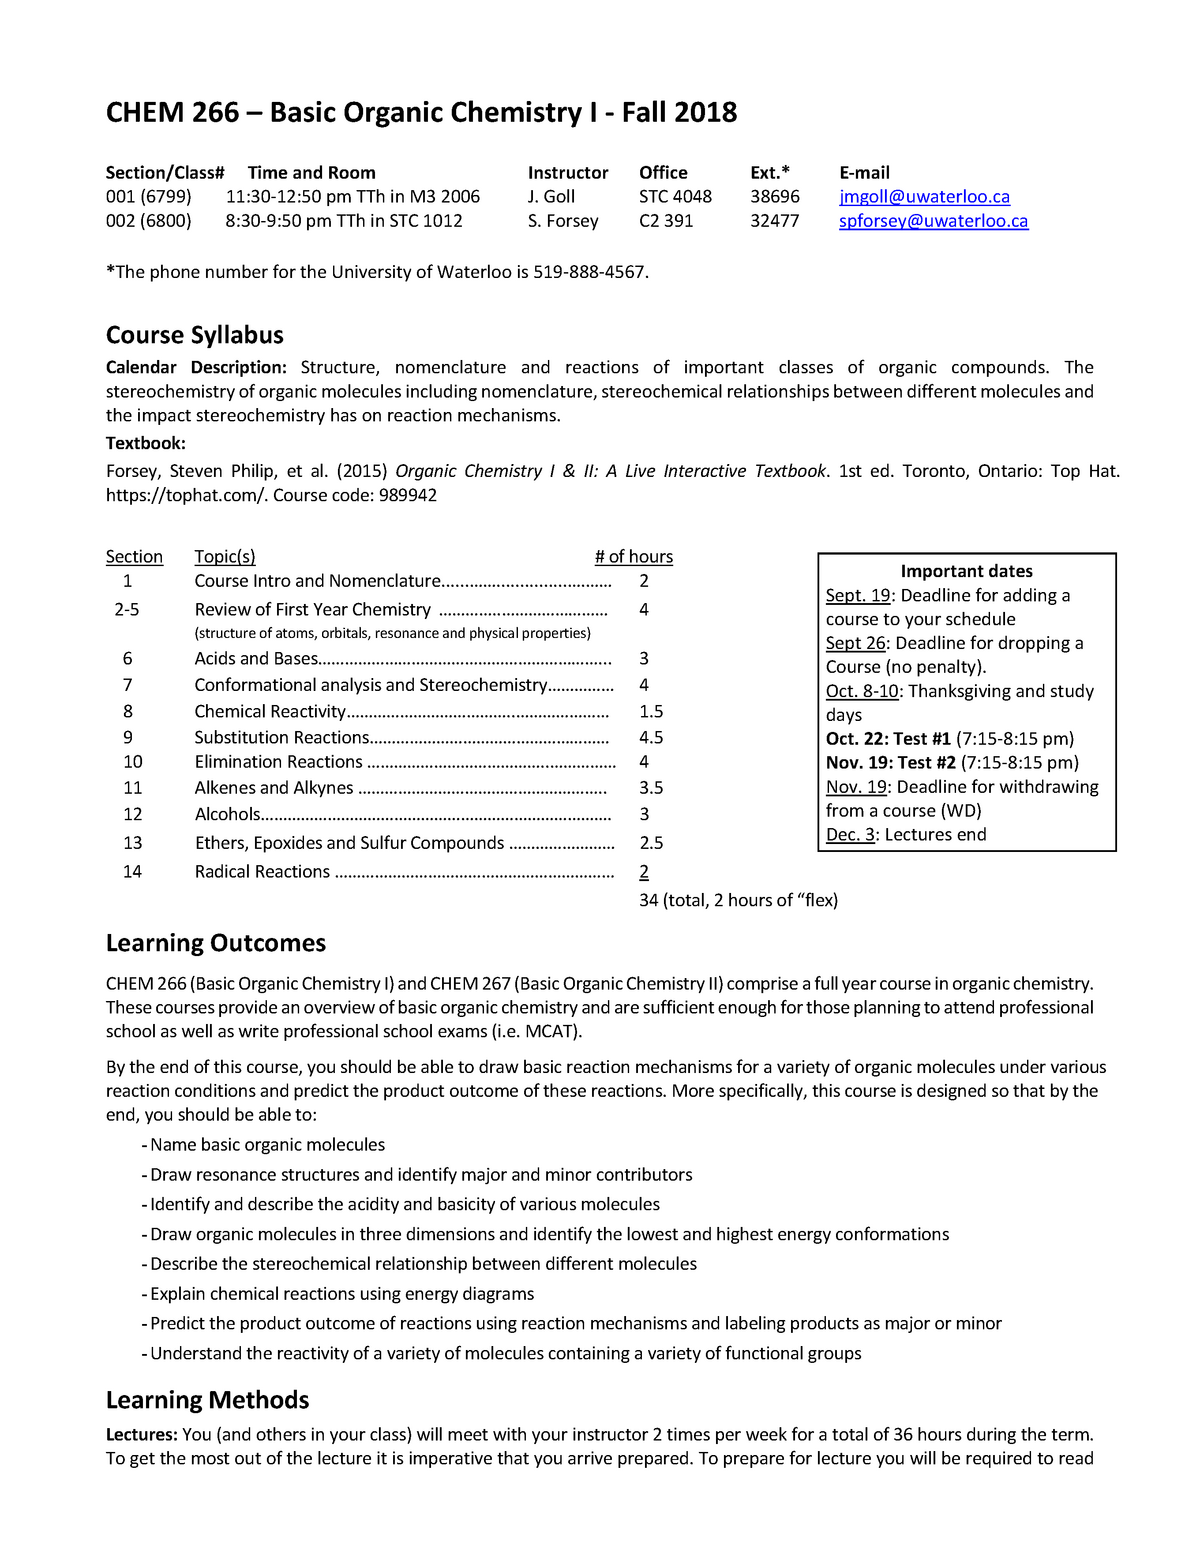 CHEM 266 course outline F2018 - CHEM 266 Organic Chemistry